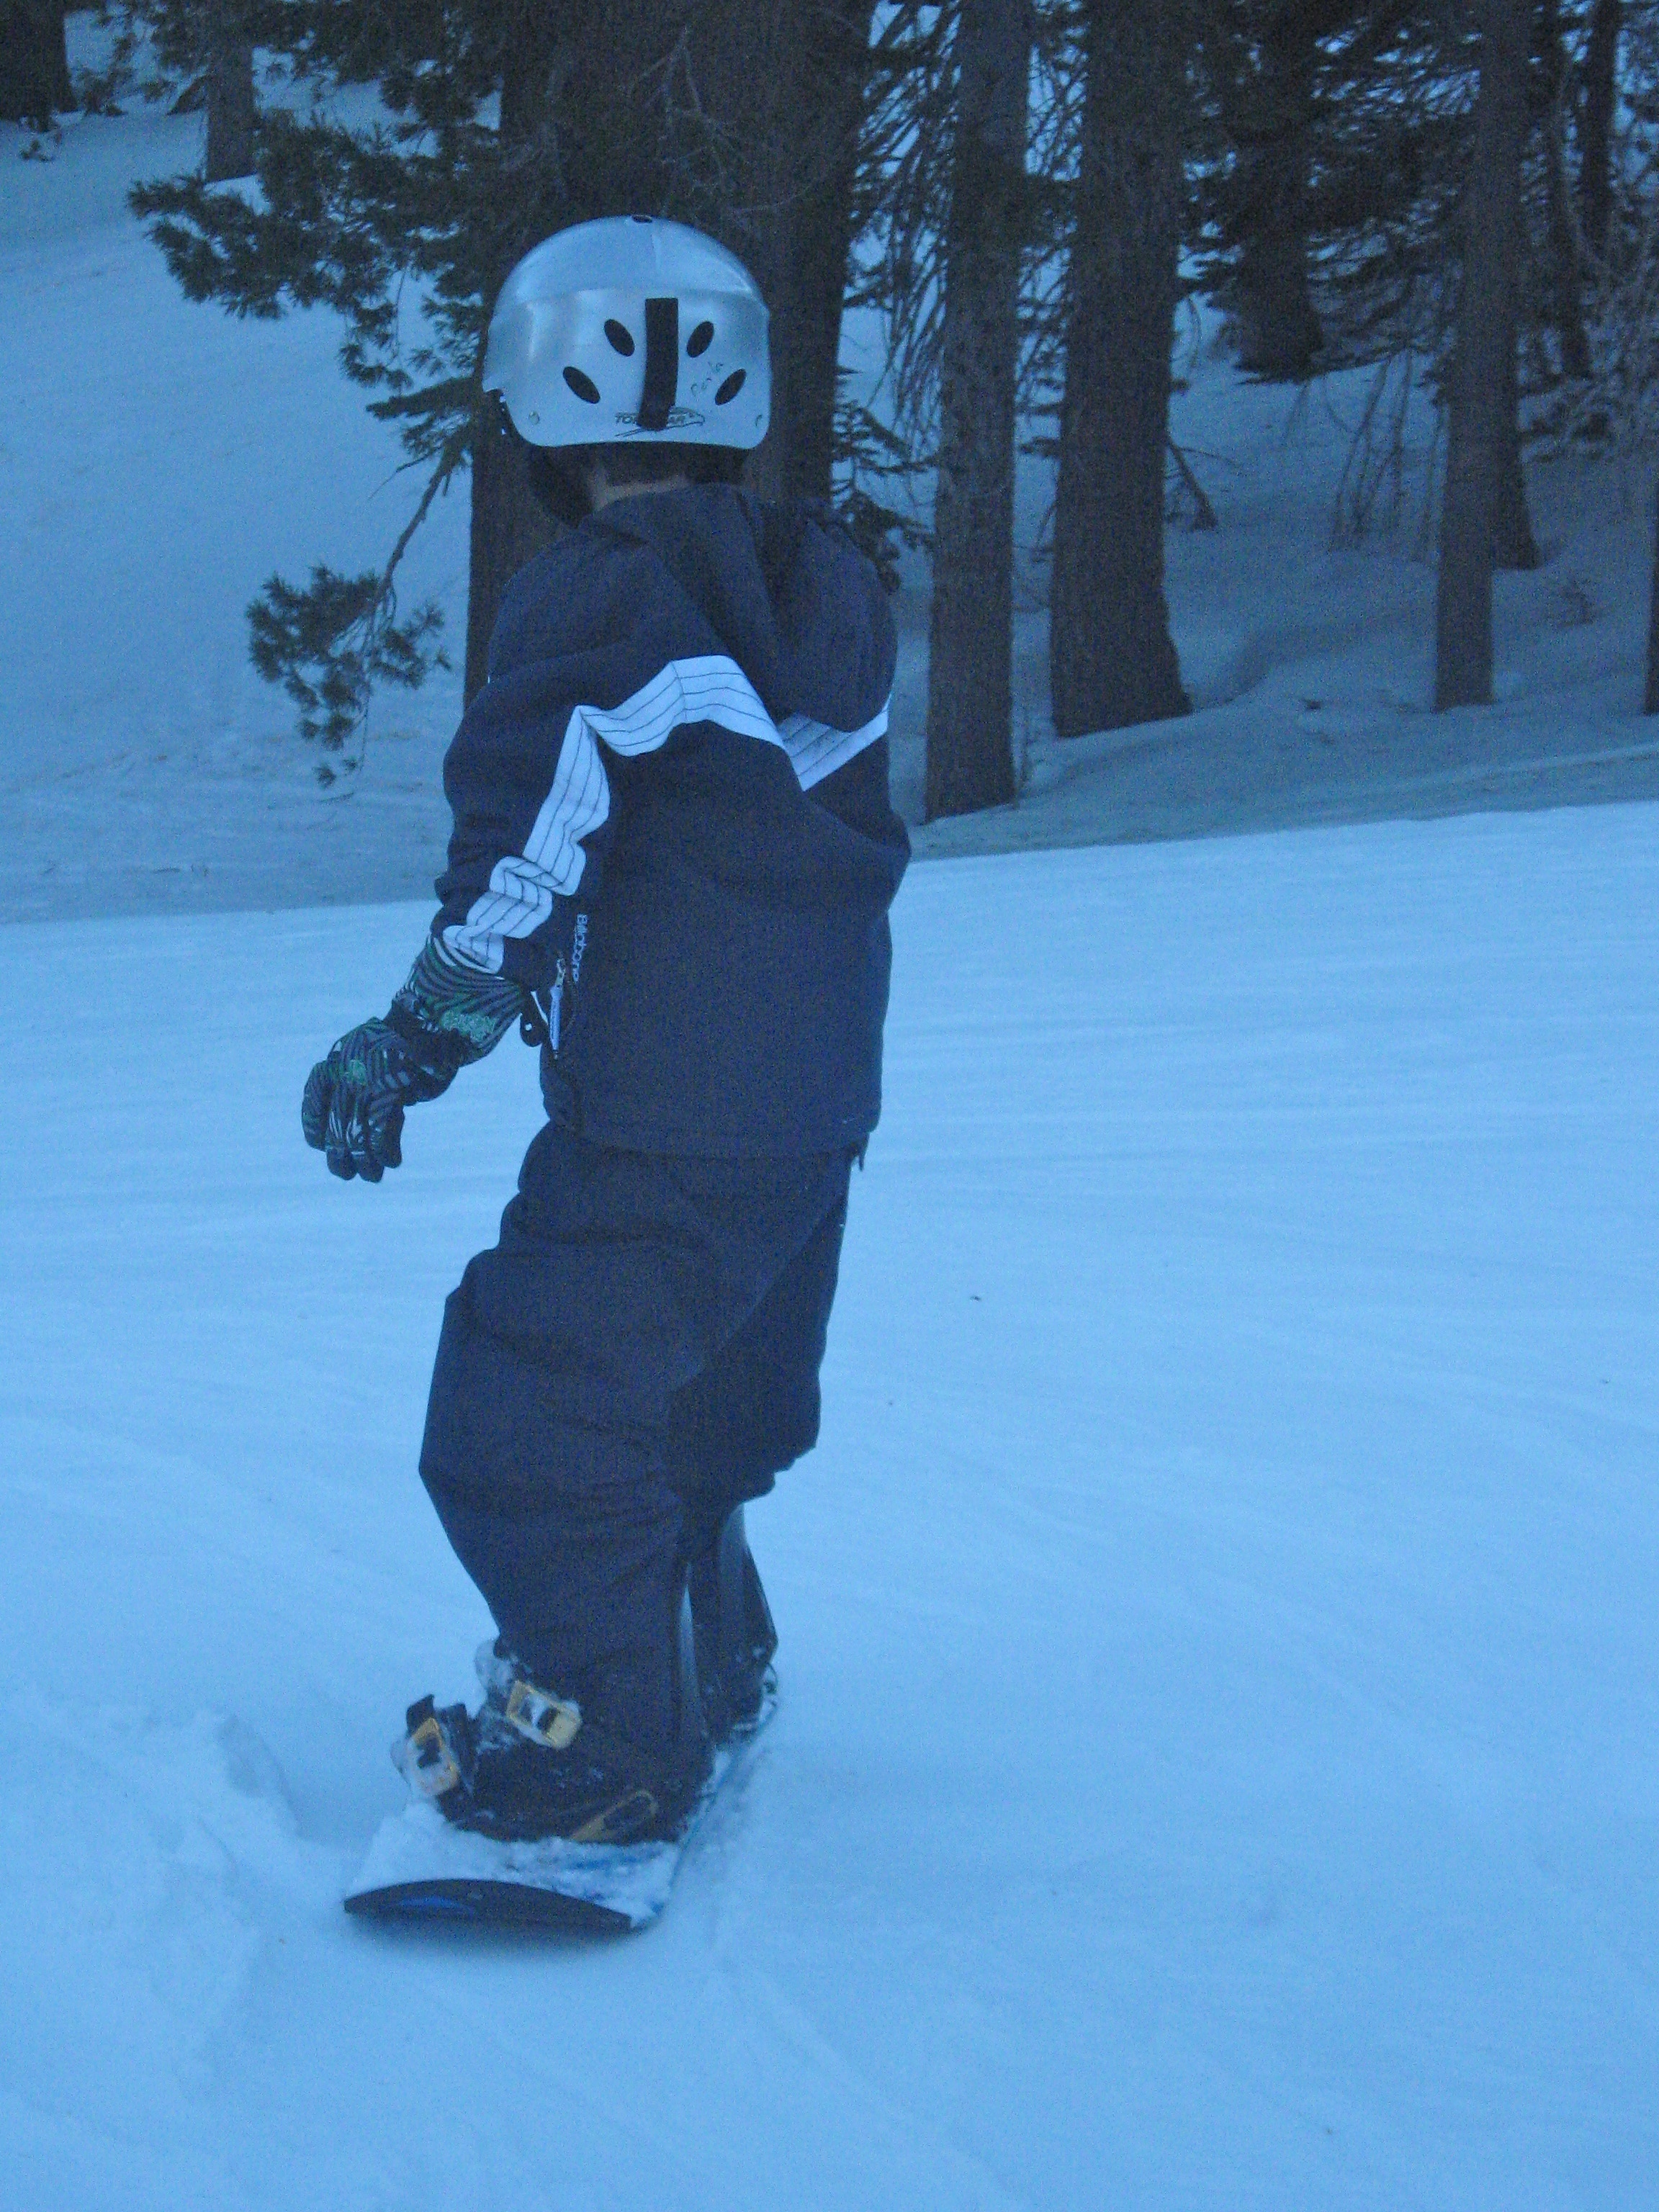 snowboard-027